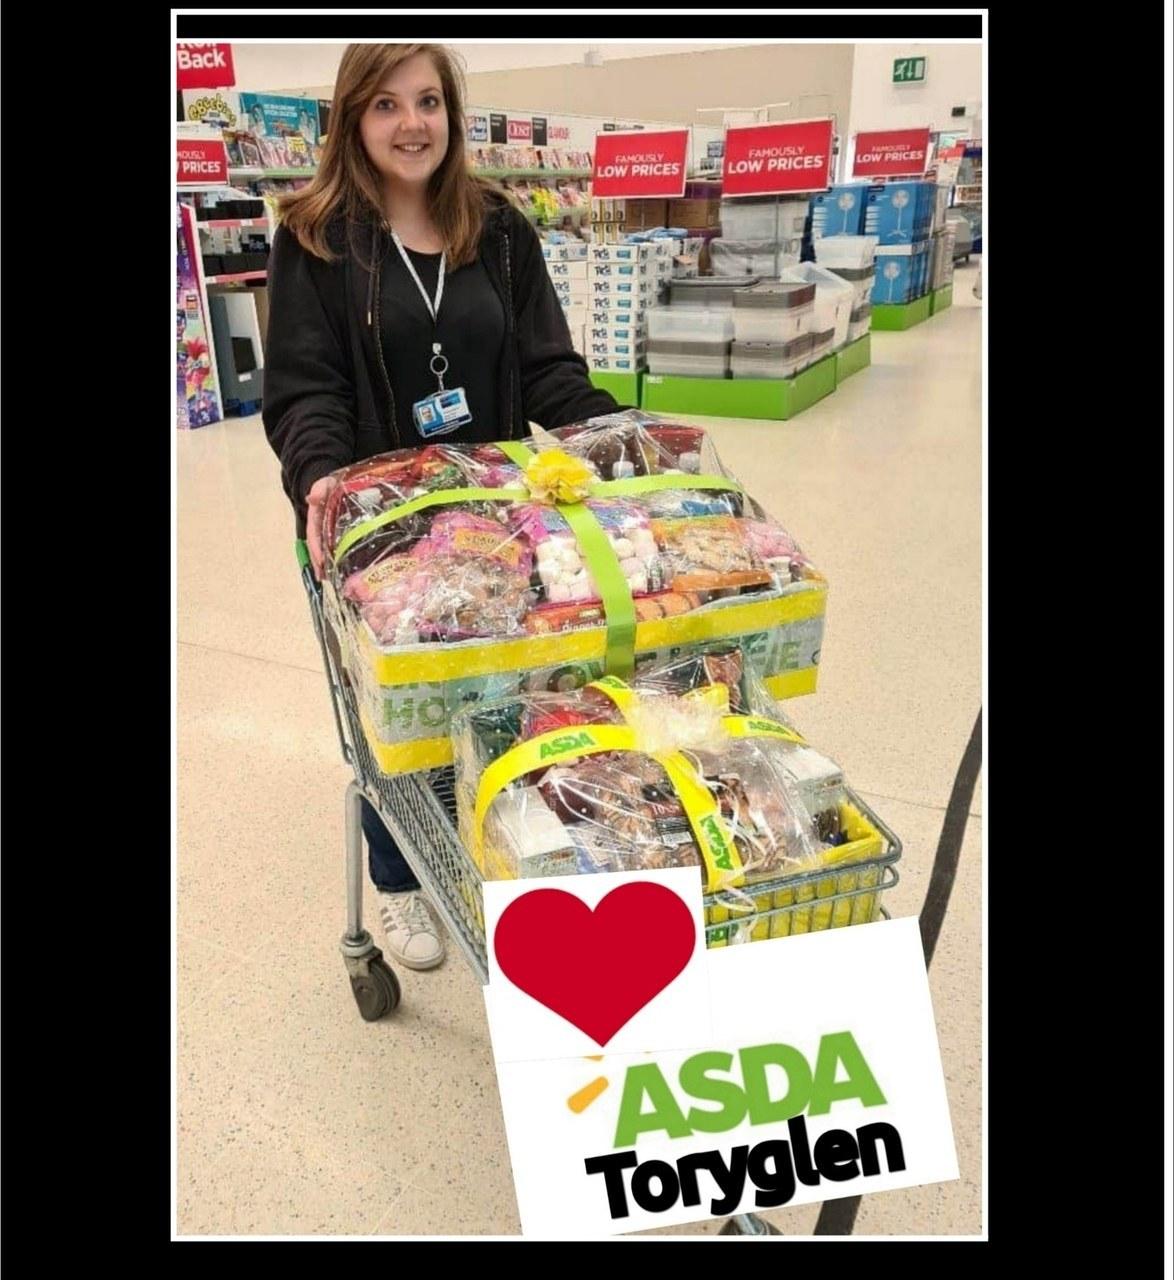 Continued support forDavid Walker Gardens | Asda Toryglen